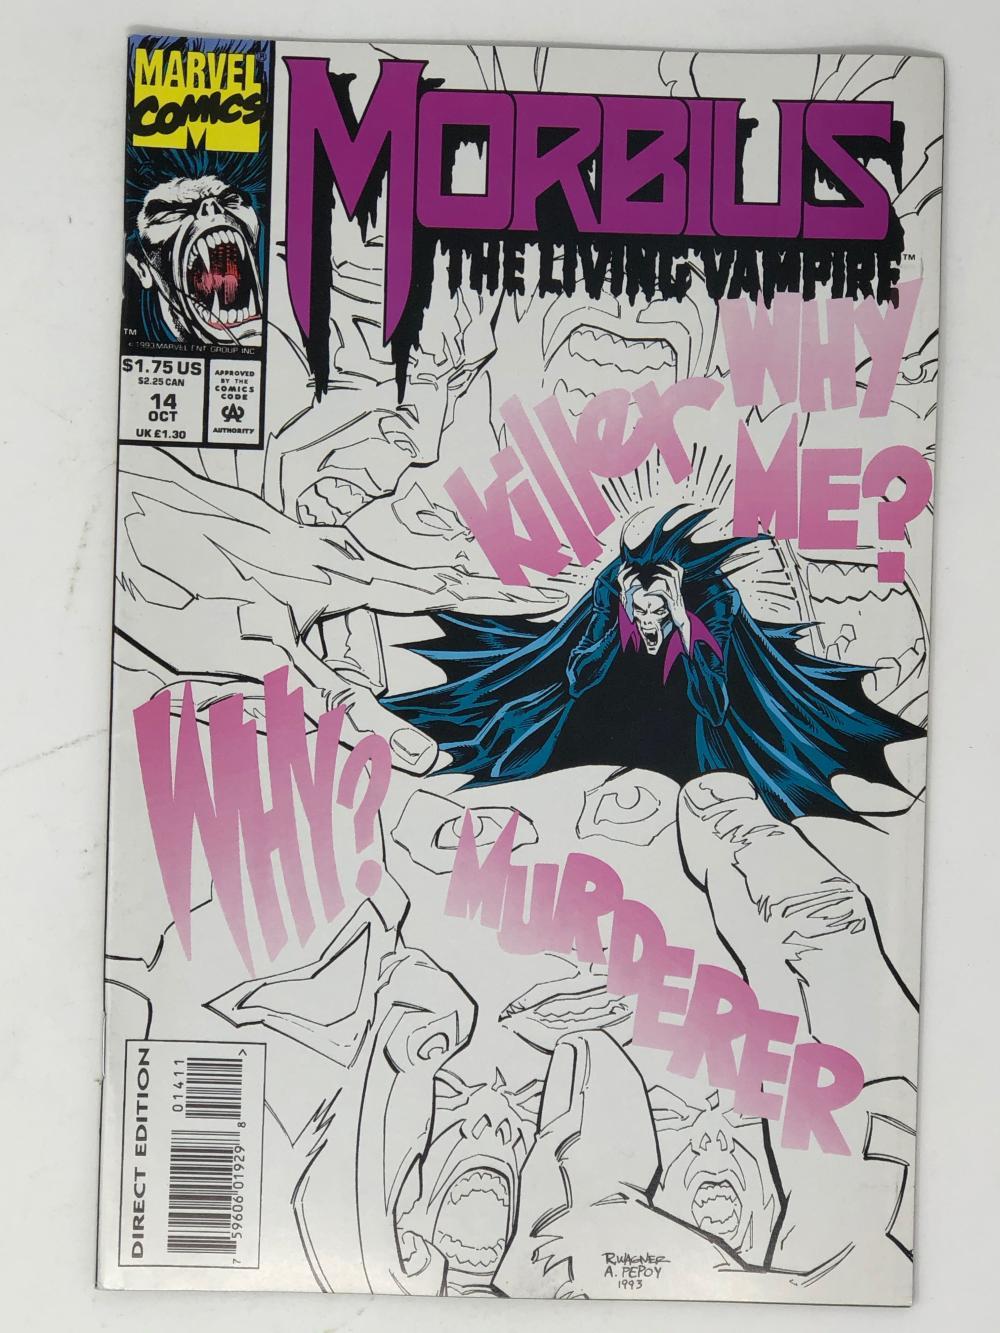 MARVEL, MORBIUS the living vampire 14